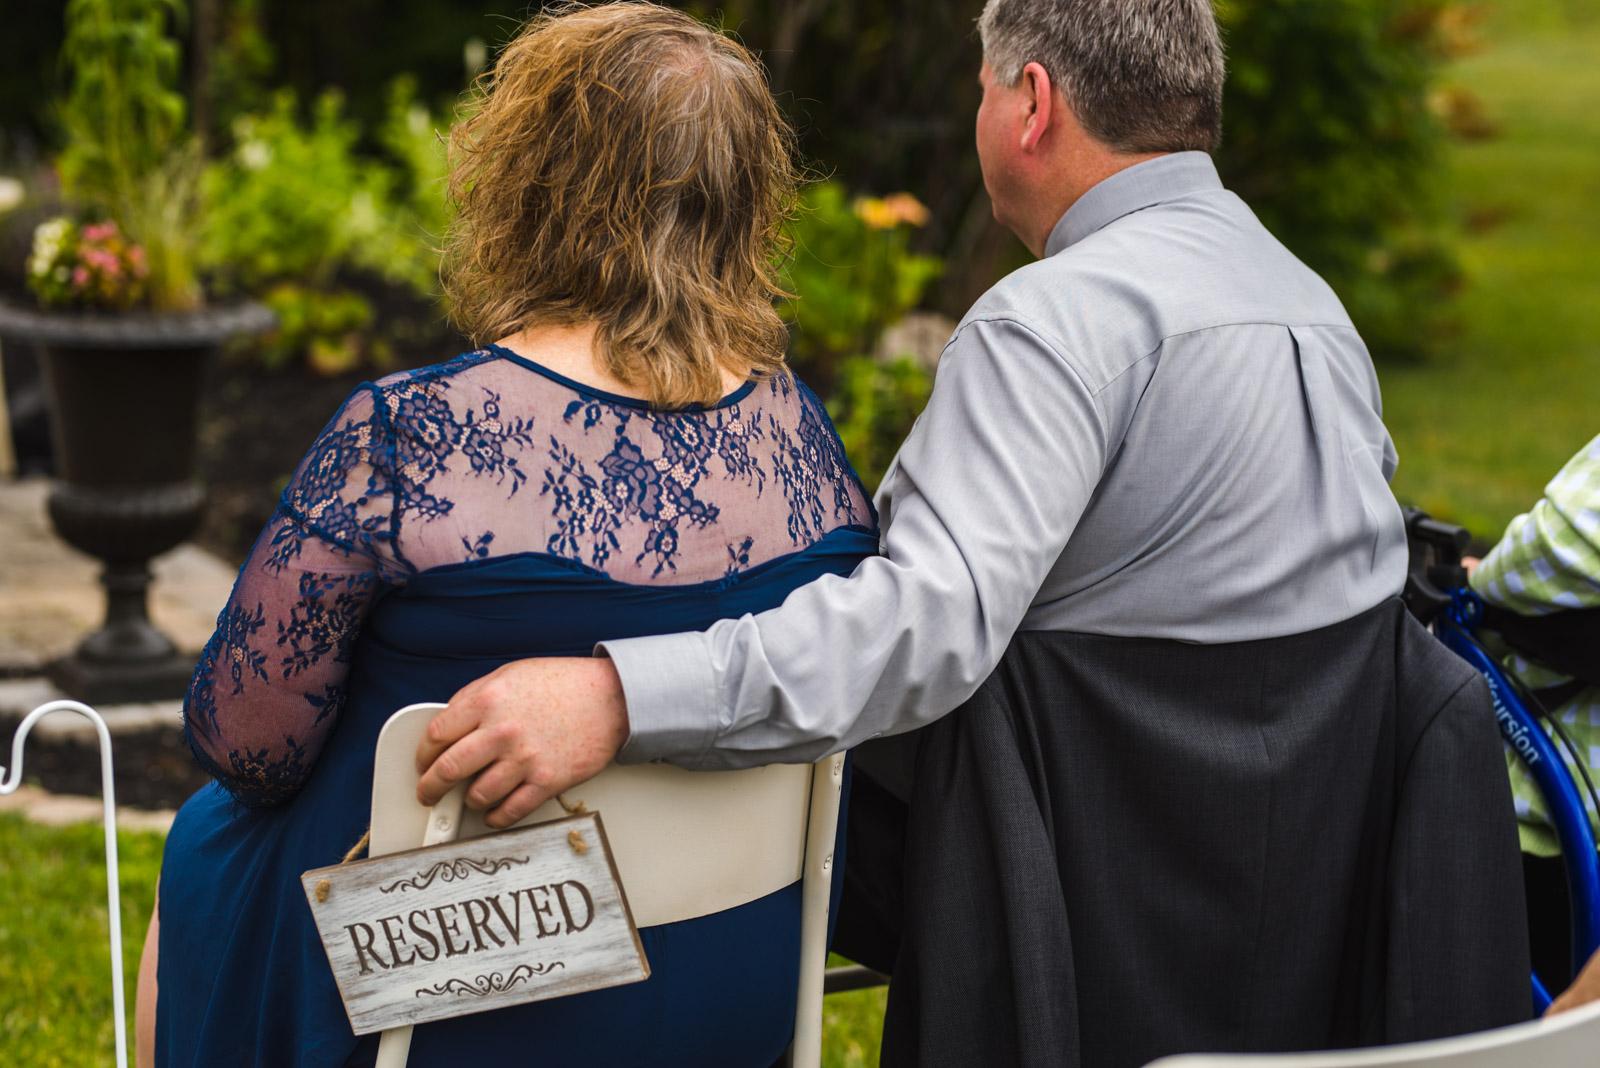 Emerson & Elicia's Golf Course Wedding Aidan & Leanne Hennebry Hamilton Wedding Videographers Photographers Niagara Hush Hush Photography & Film-20.jpg